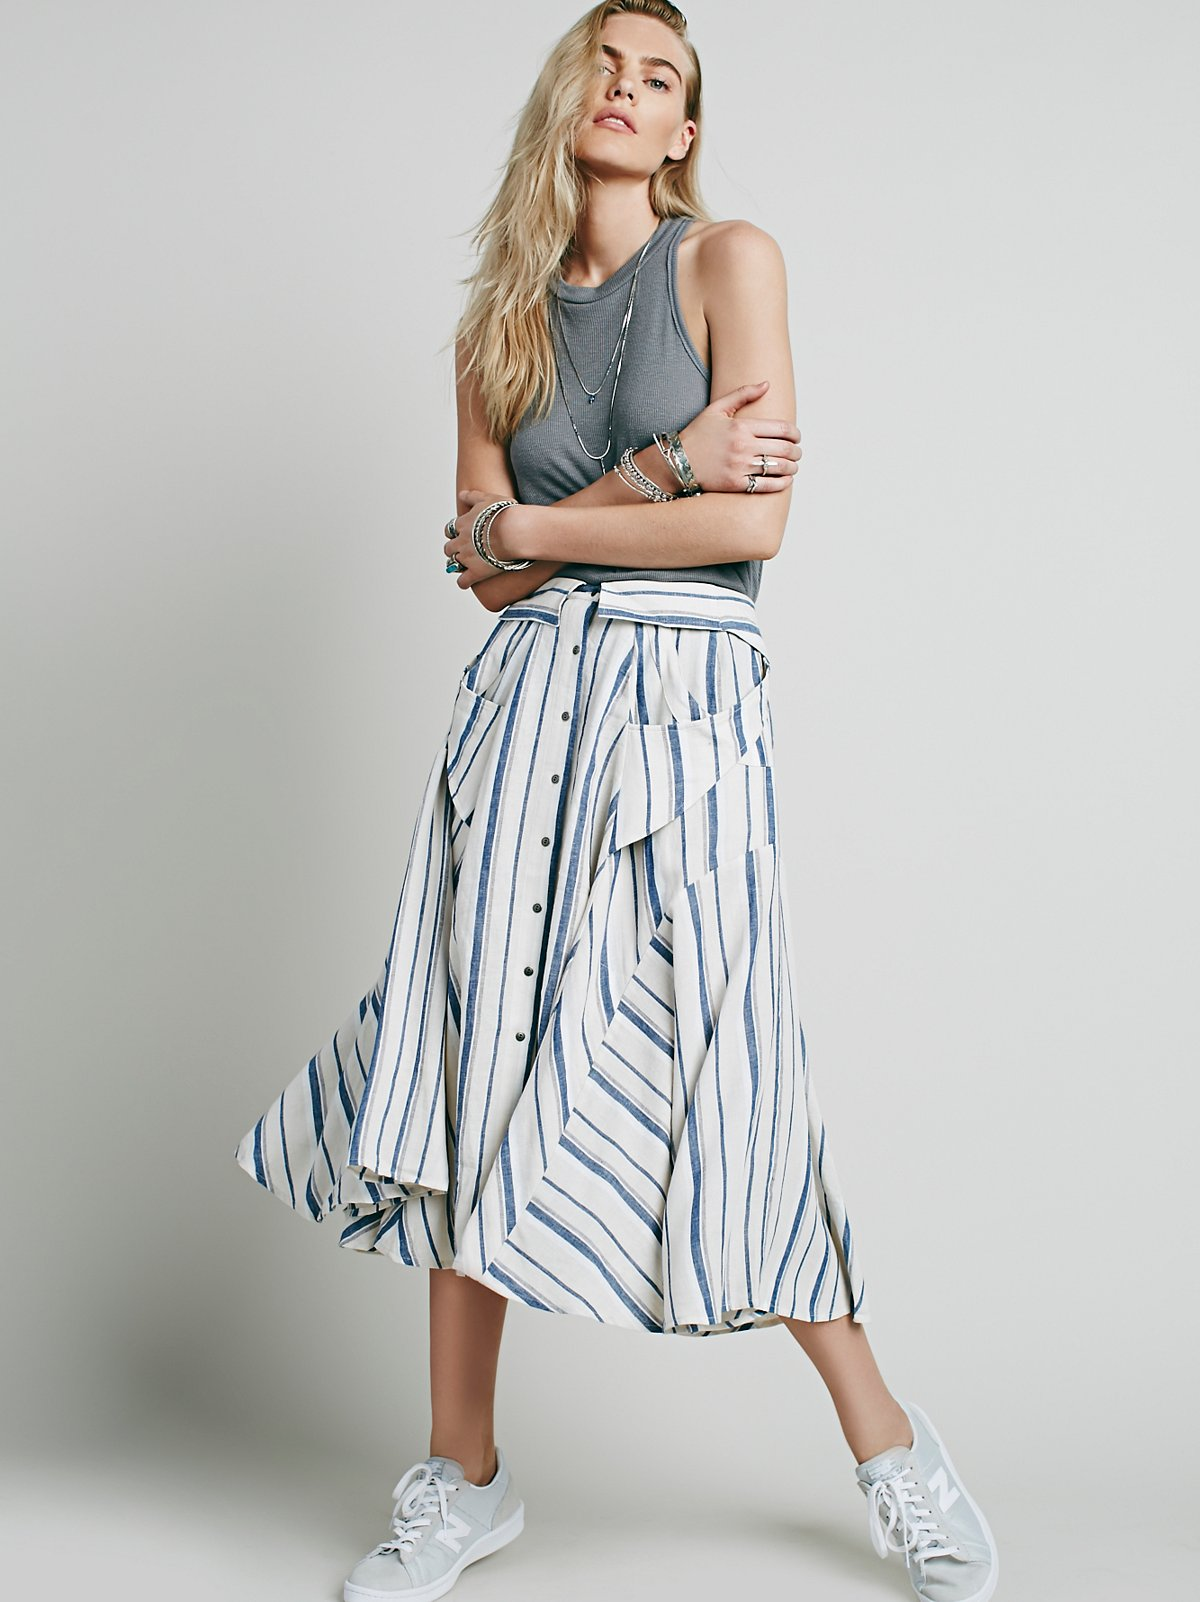 Boardwalk Babe Midi Skirt